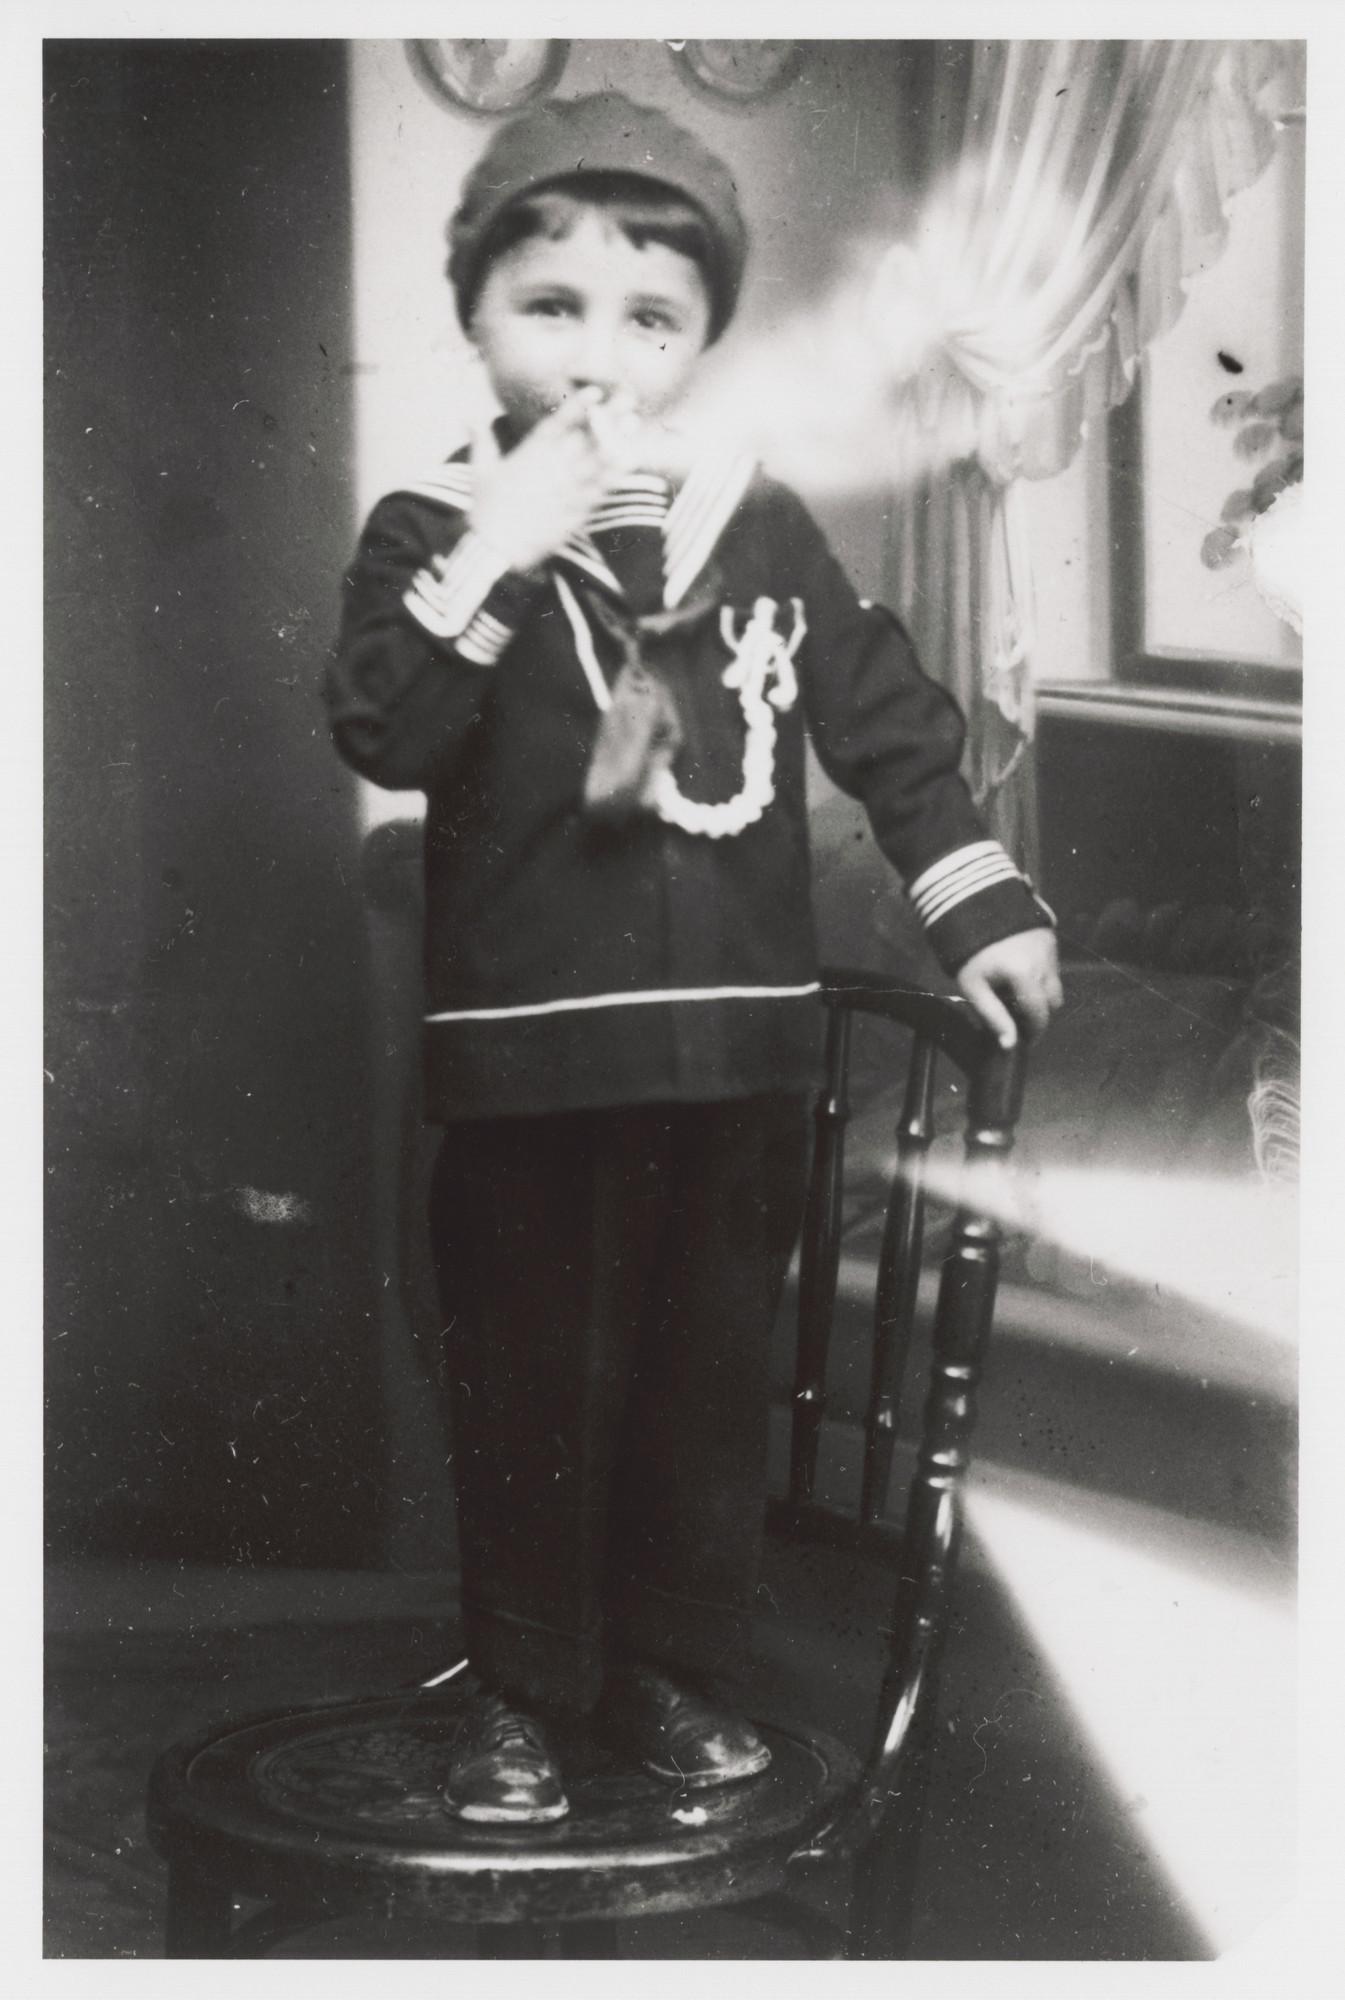 Portrait of Victor Nahmias as a young boy.